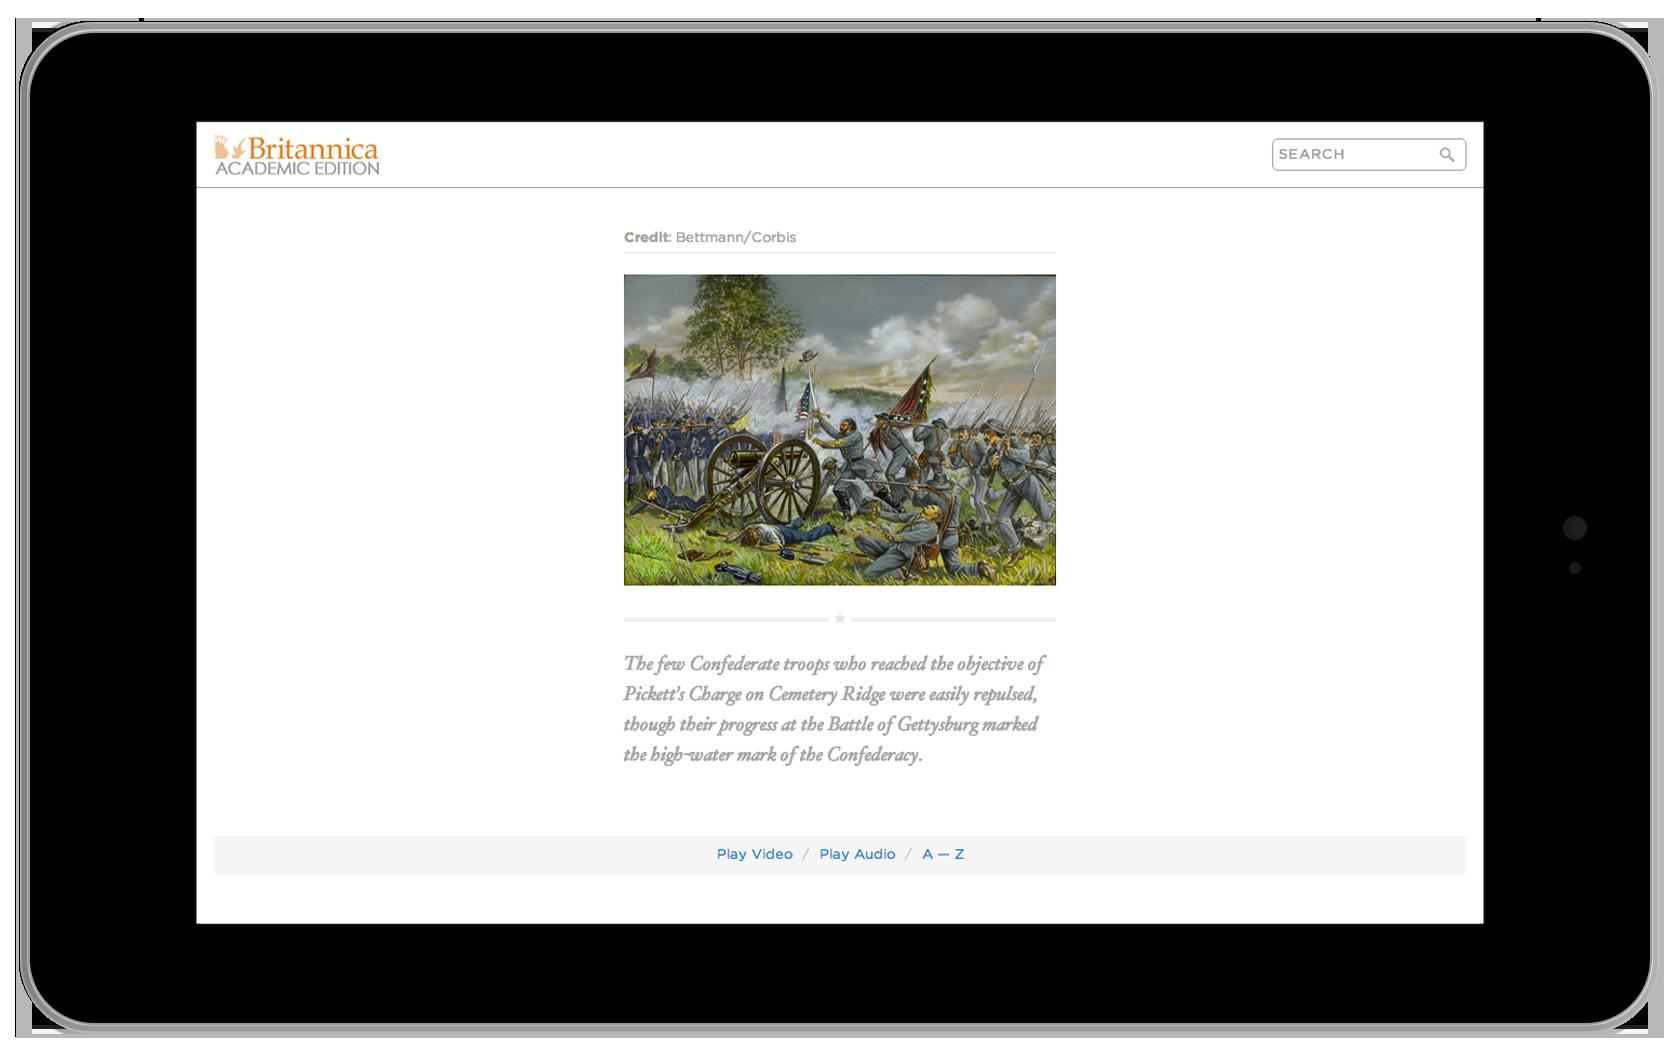 Encyclopedia Britannica Asset Screen